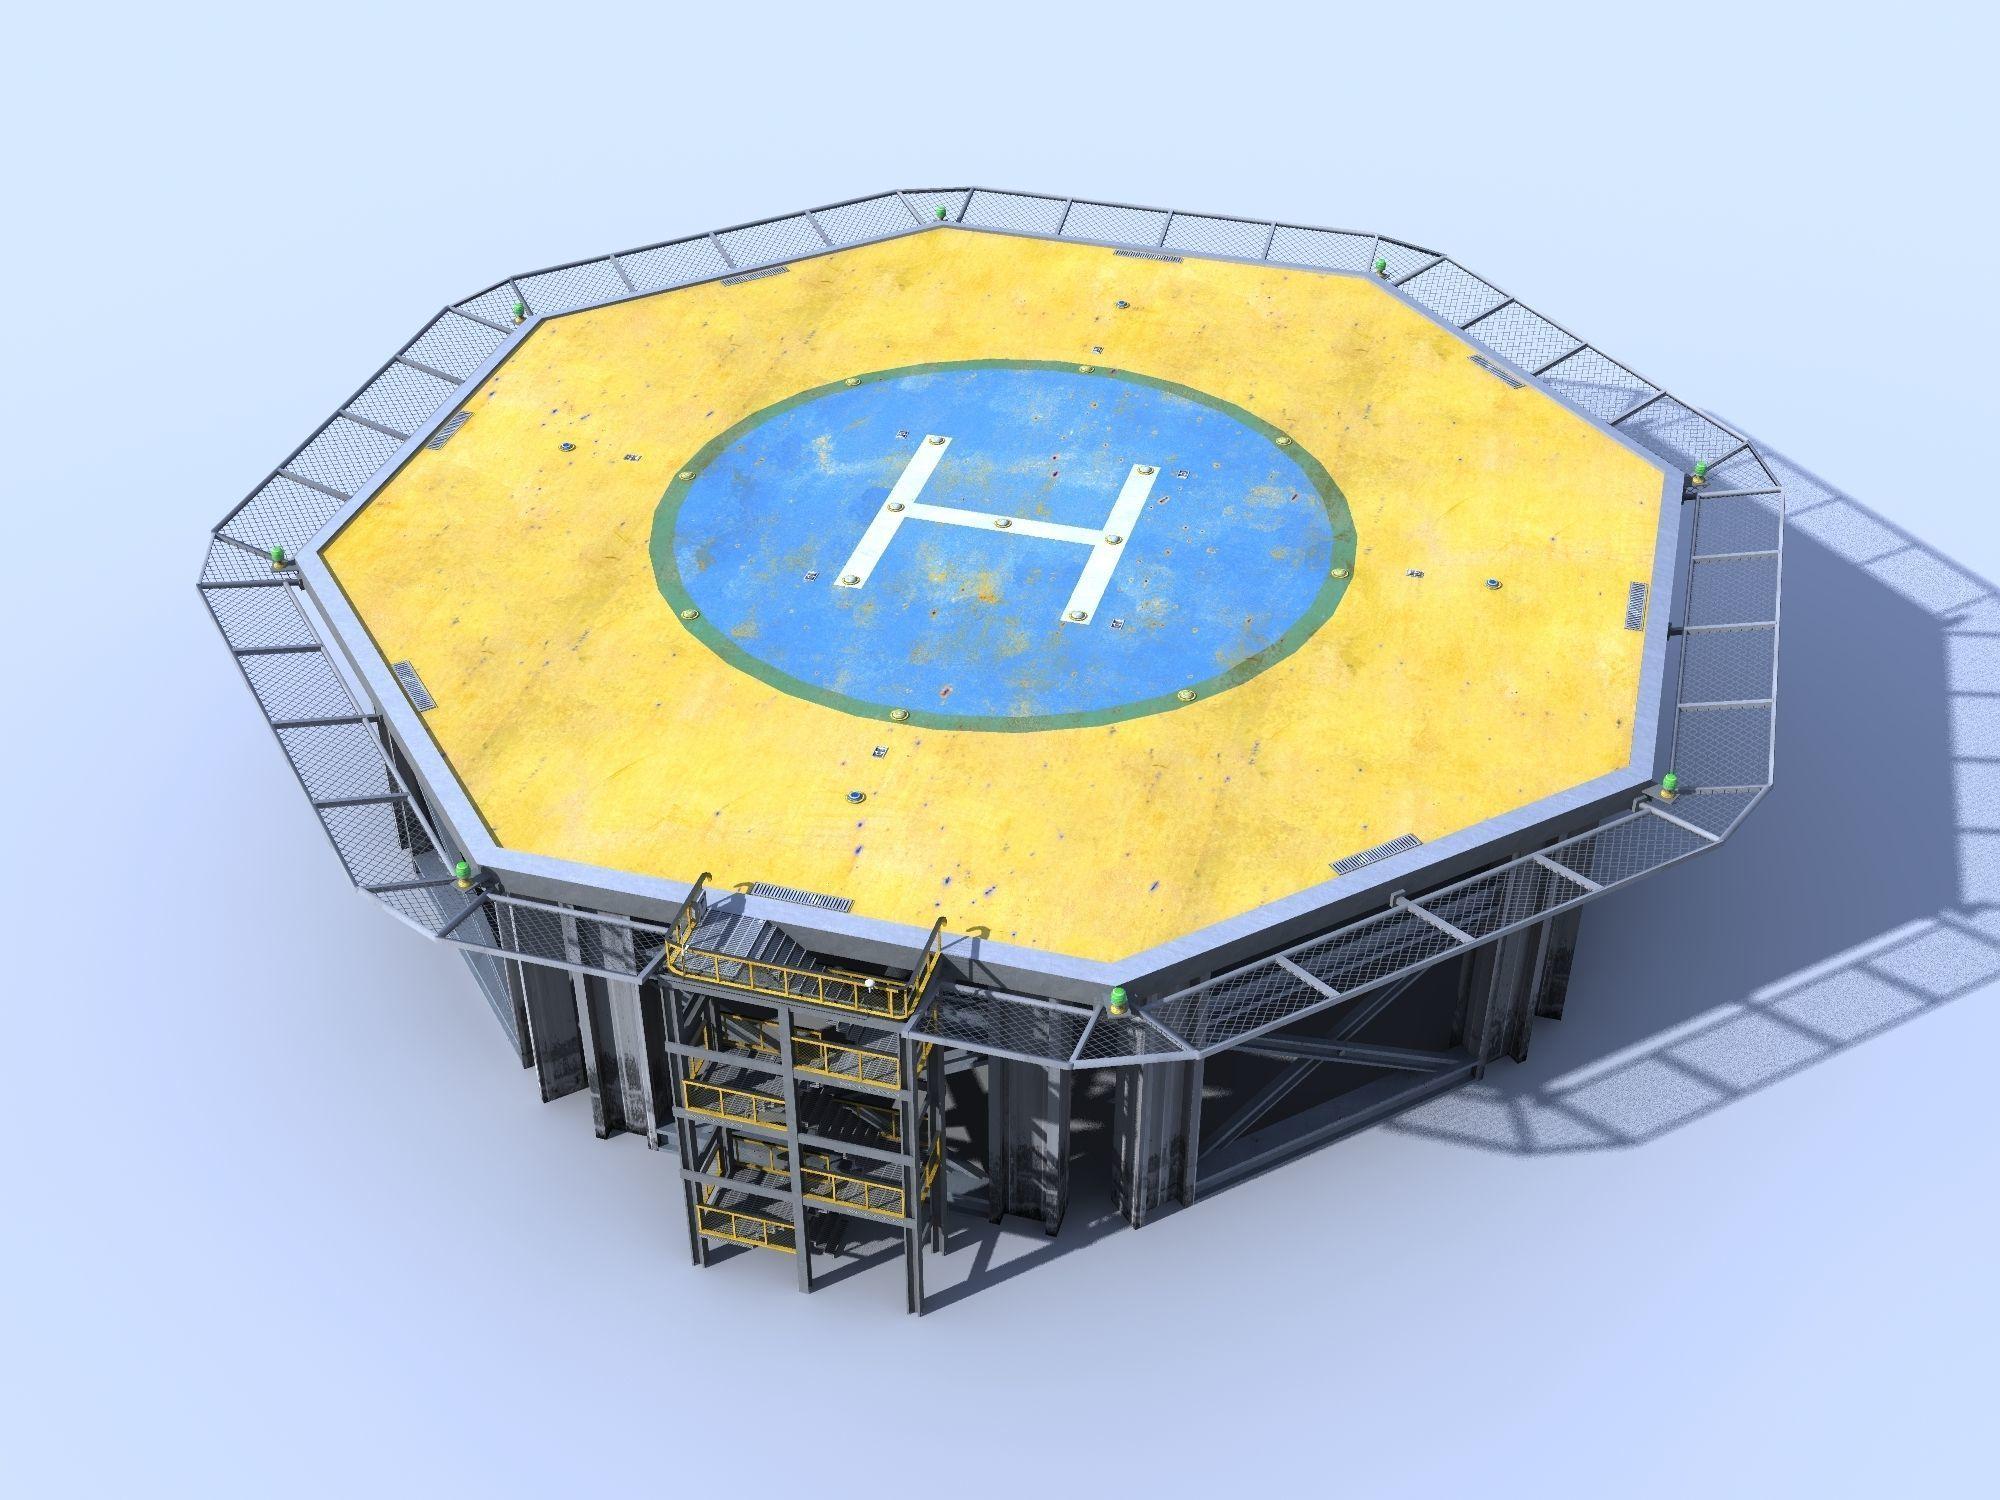 Helicopter industrial landing pad Orange - helipad - airfield